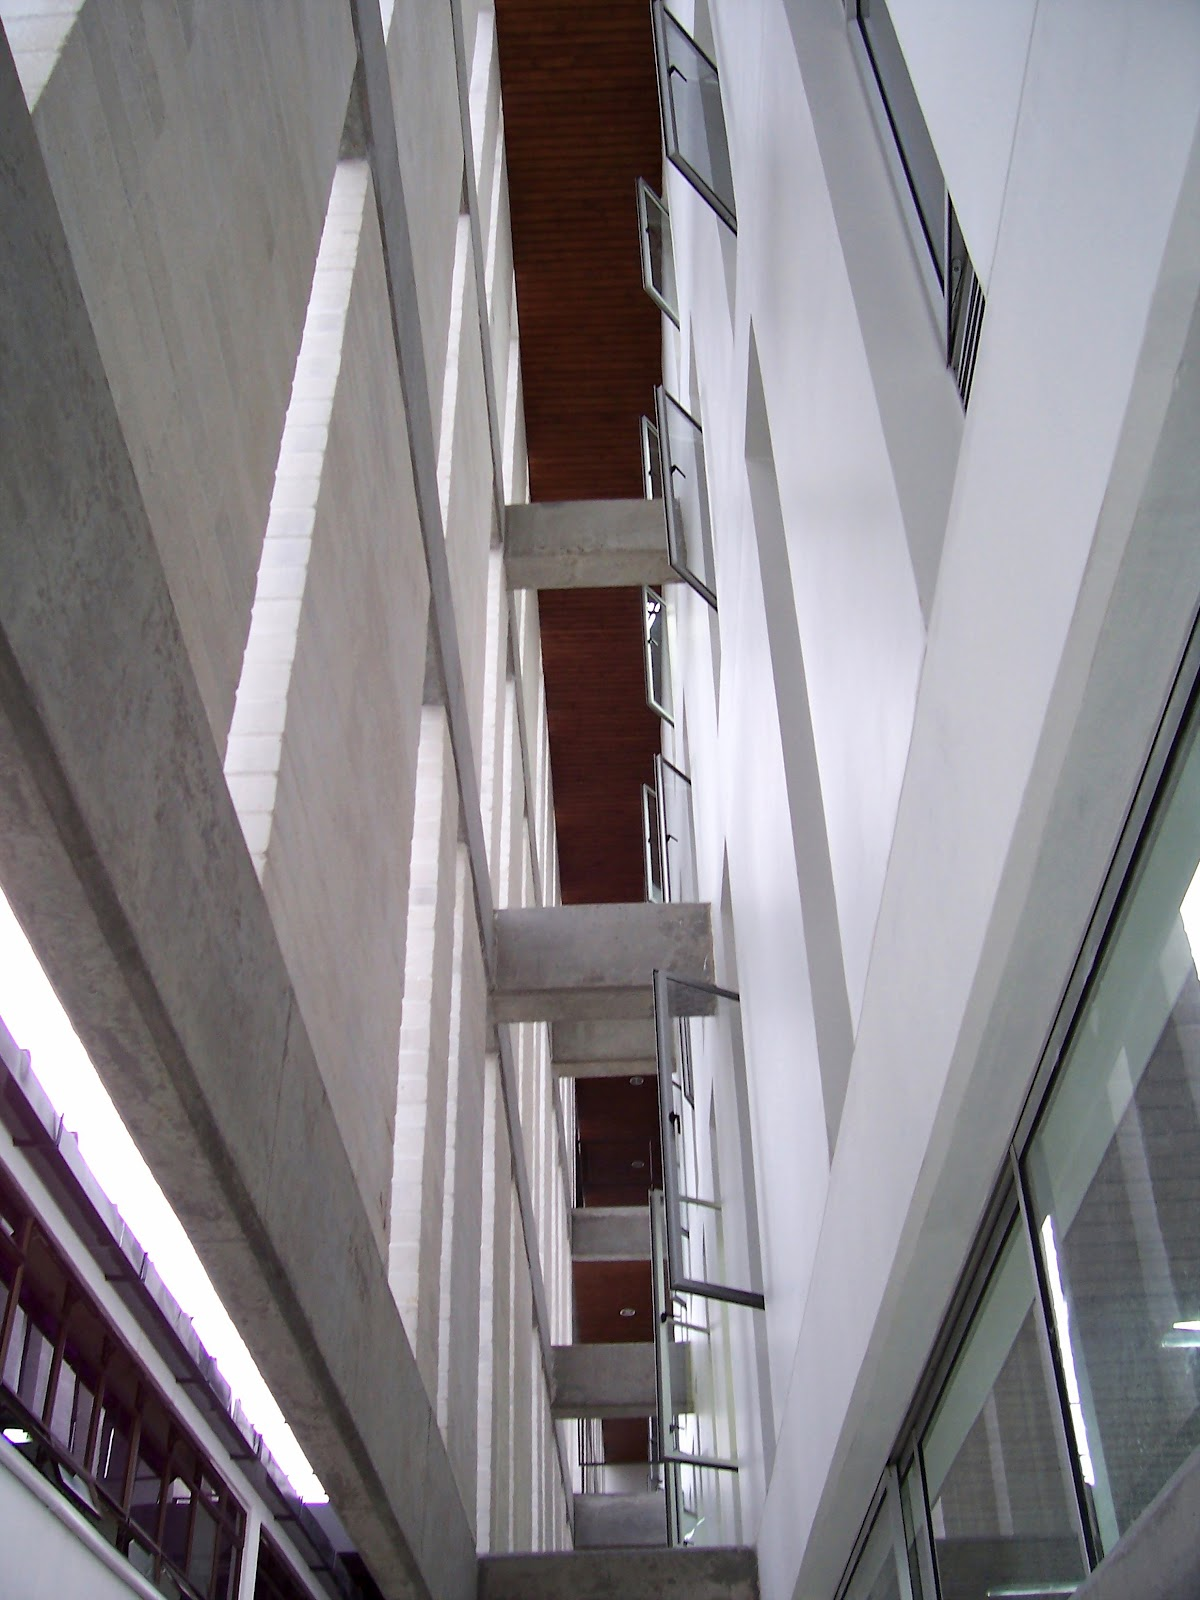 Modulo 2 estudio de arquitectura ampliacion bloque 11 for Estudio de arquitectura